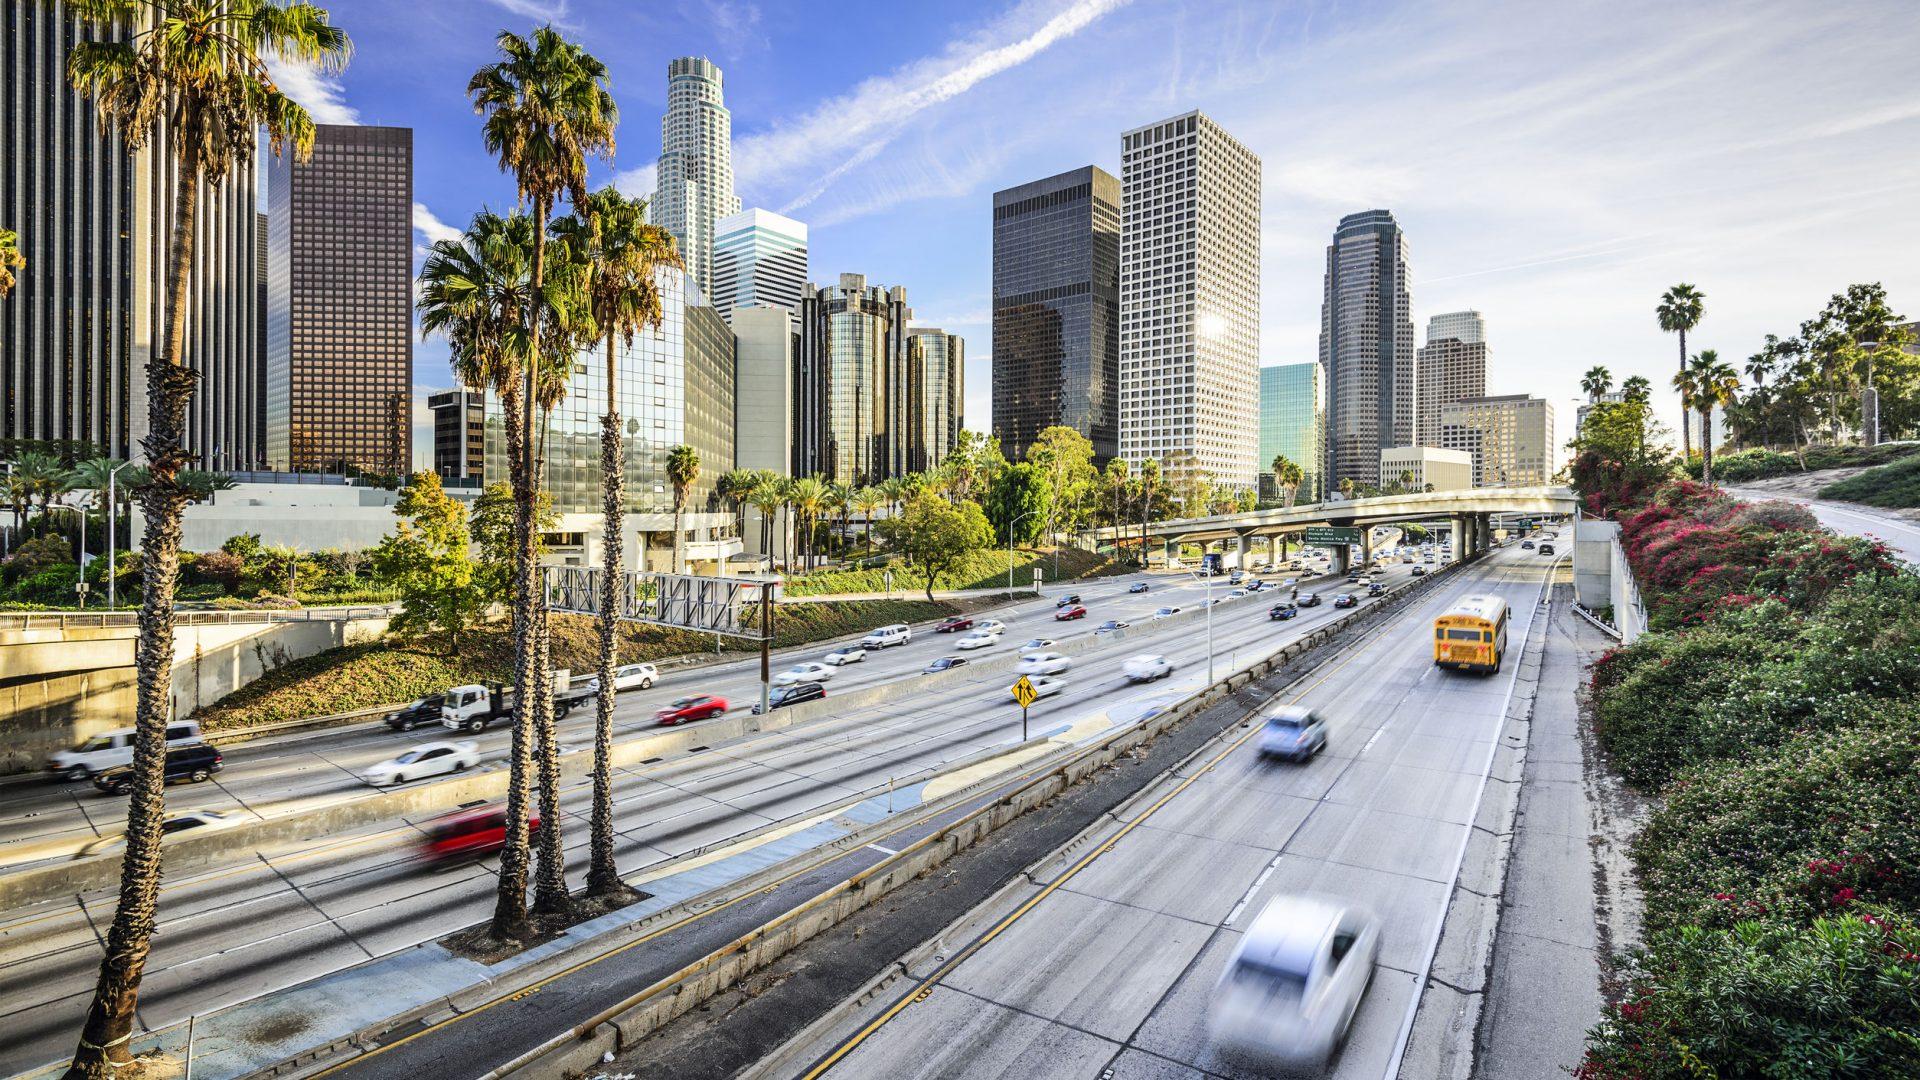 Los-Angeles-123rf